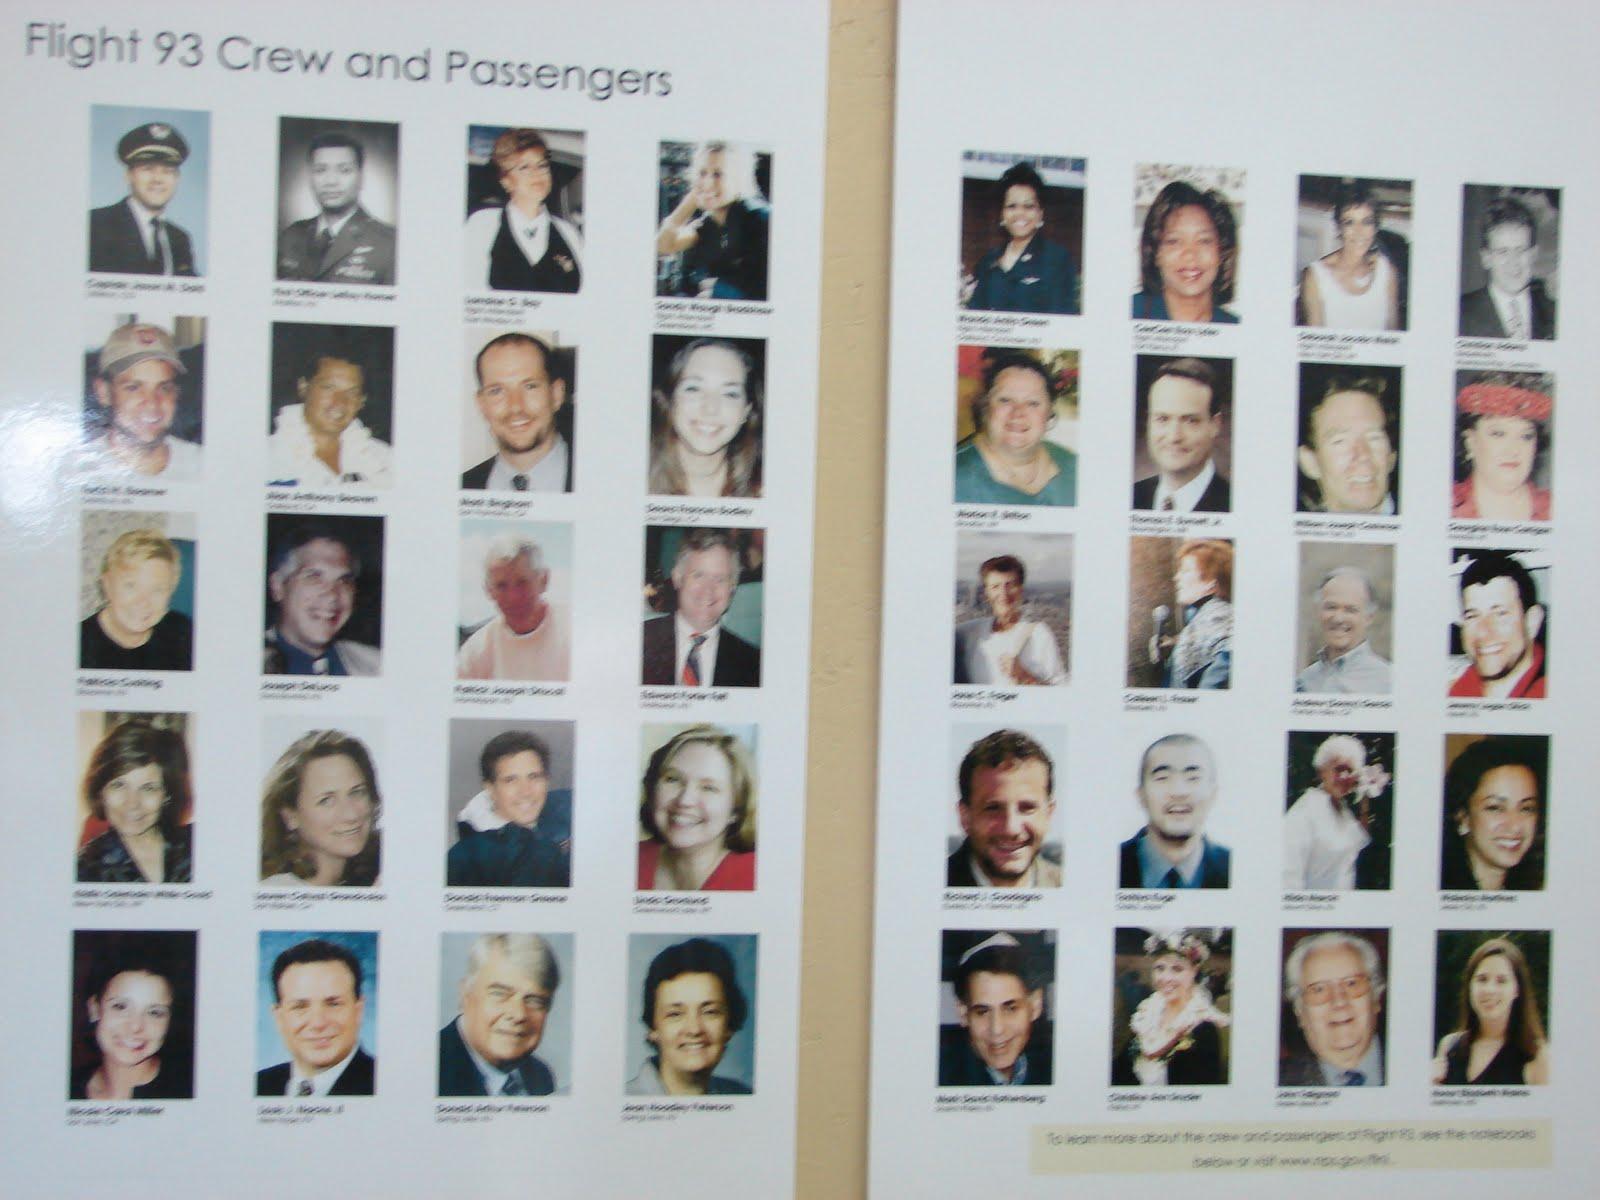 33 - 44 - 66 NPS Trip: Day 37 Johnstown Flood & Flight 93